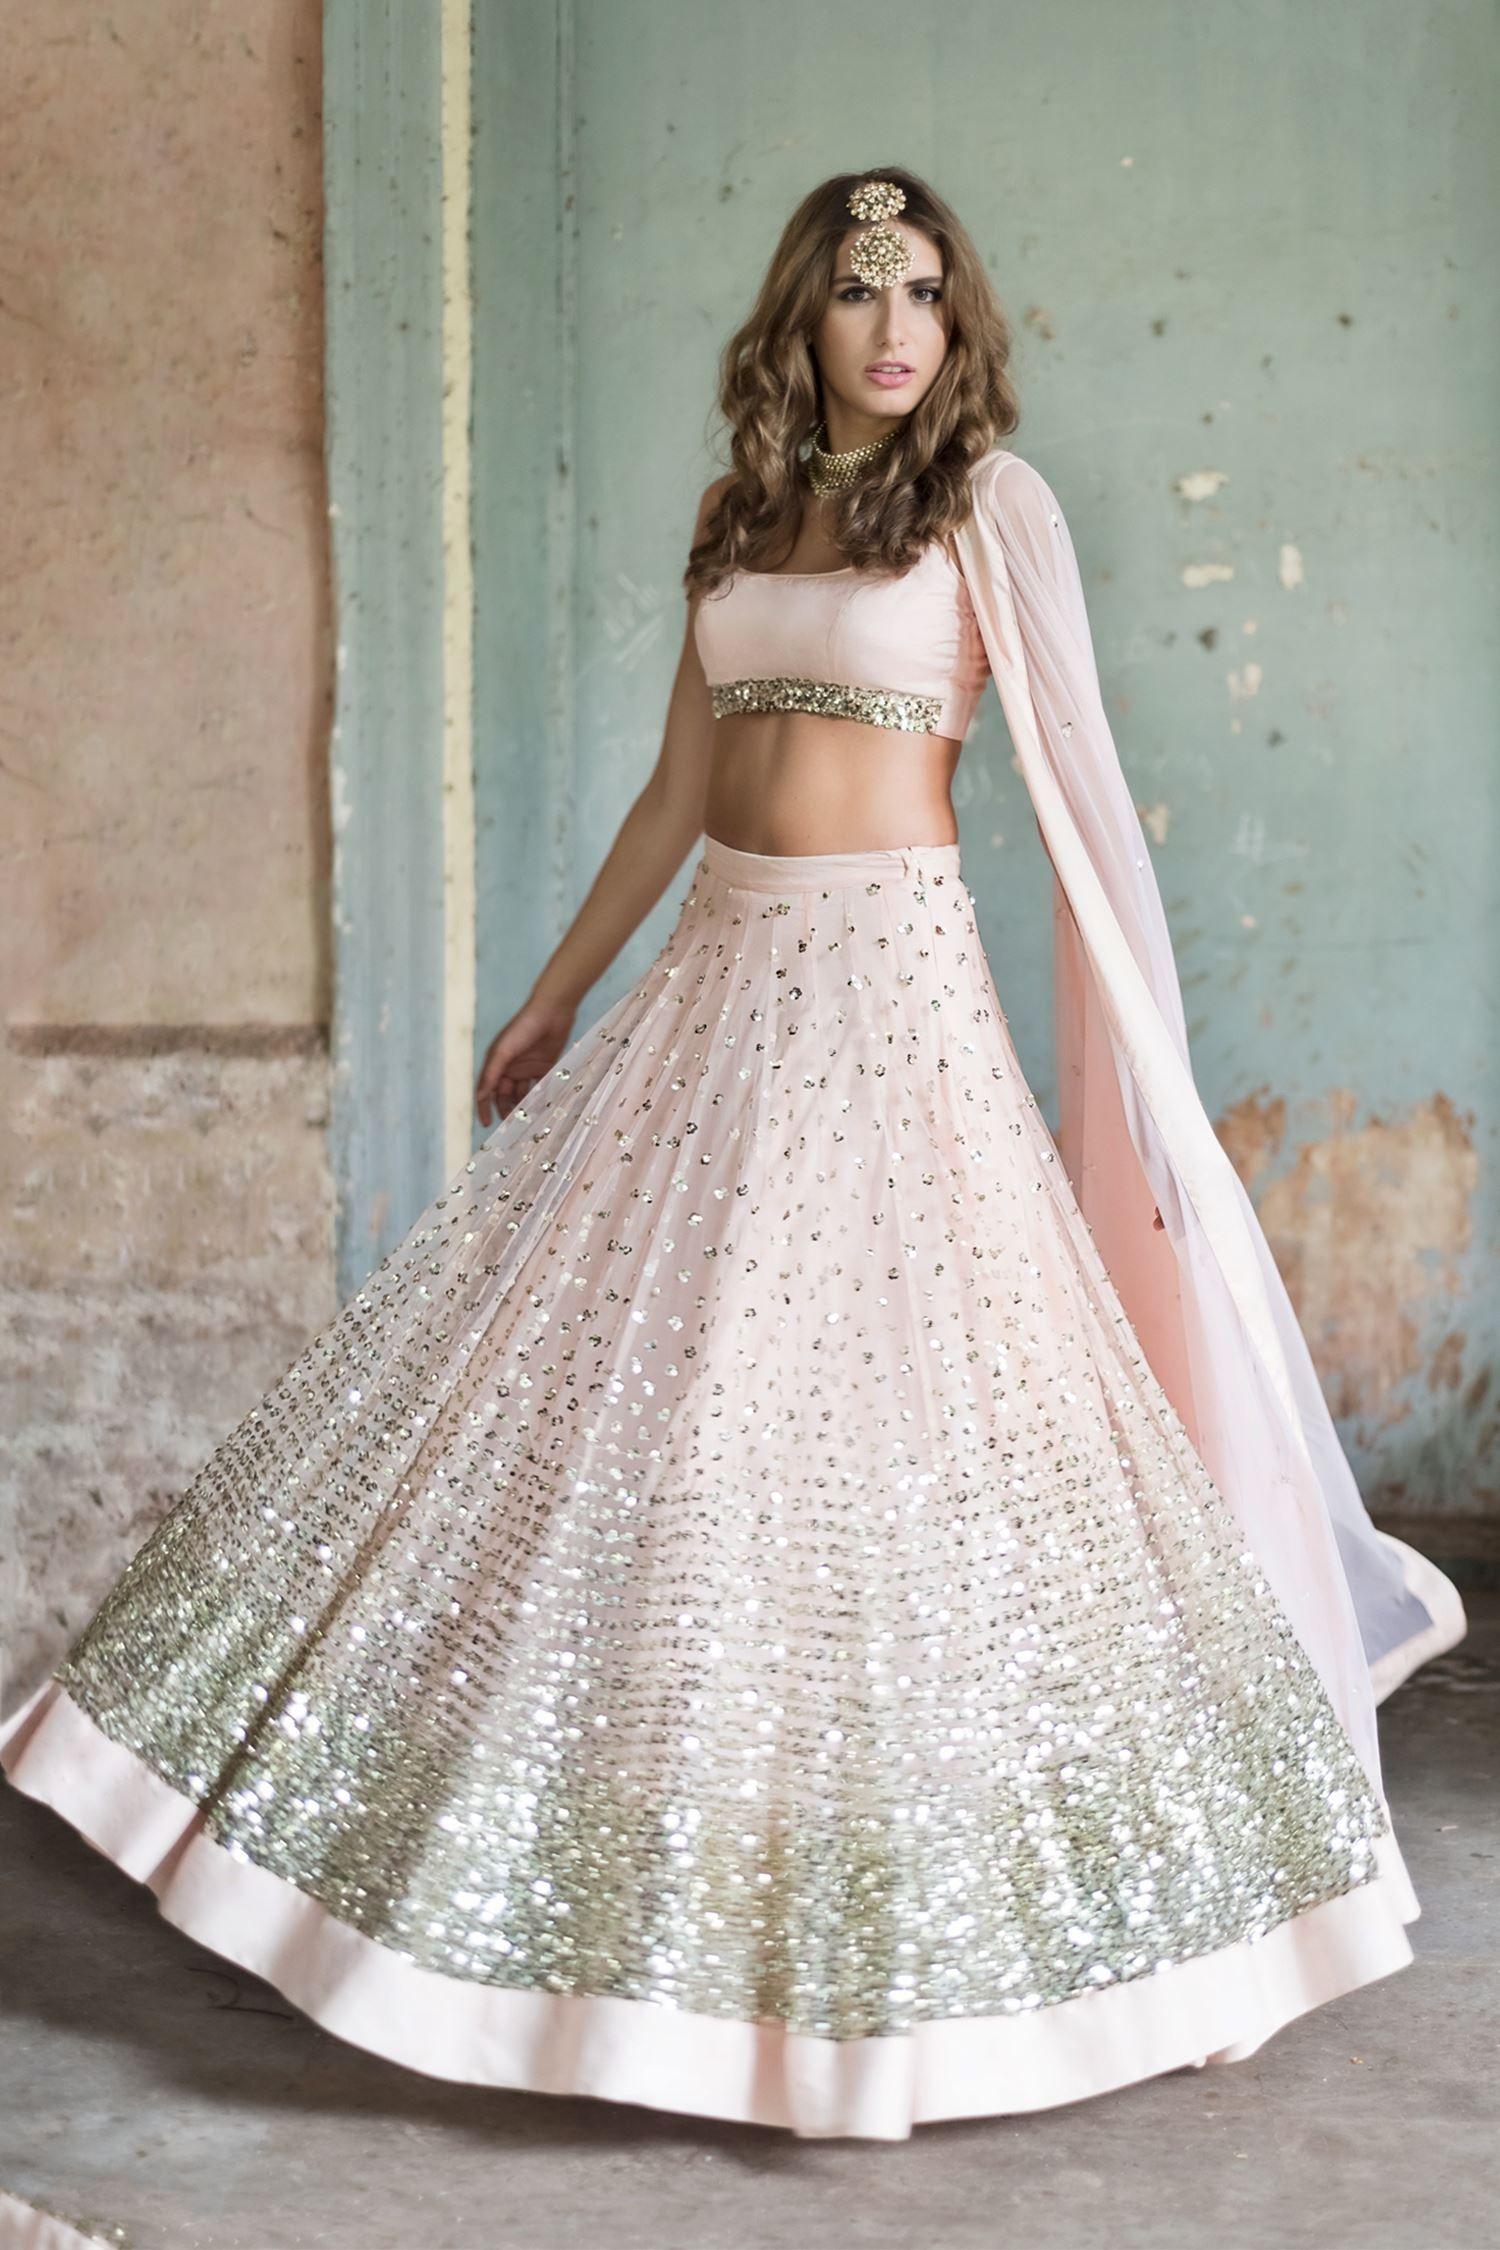 d97b4ceb08 Blush pink embellished glitter lehenga set by Prathyusha Garimella - Shop  at Aza